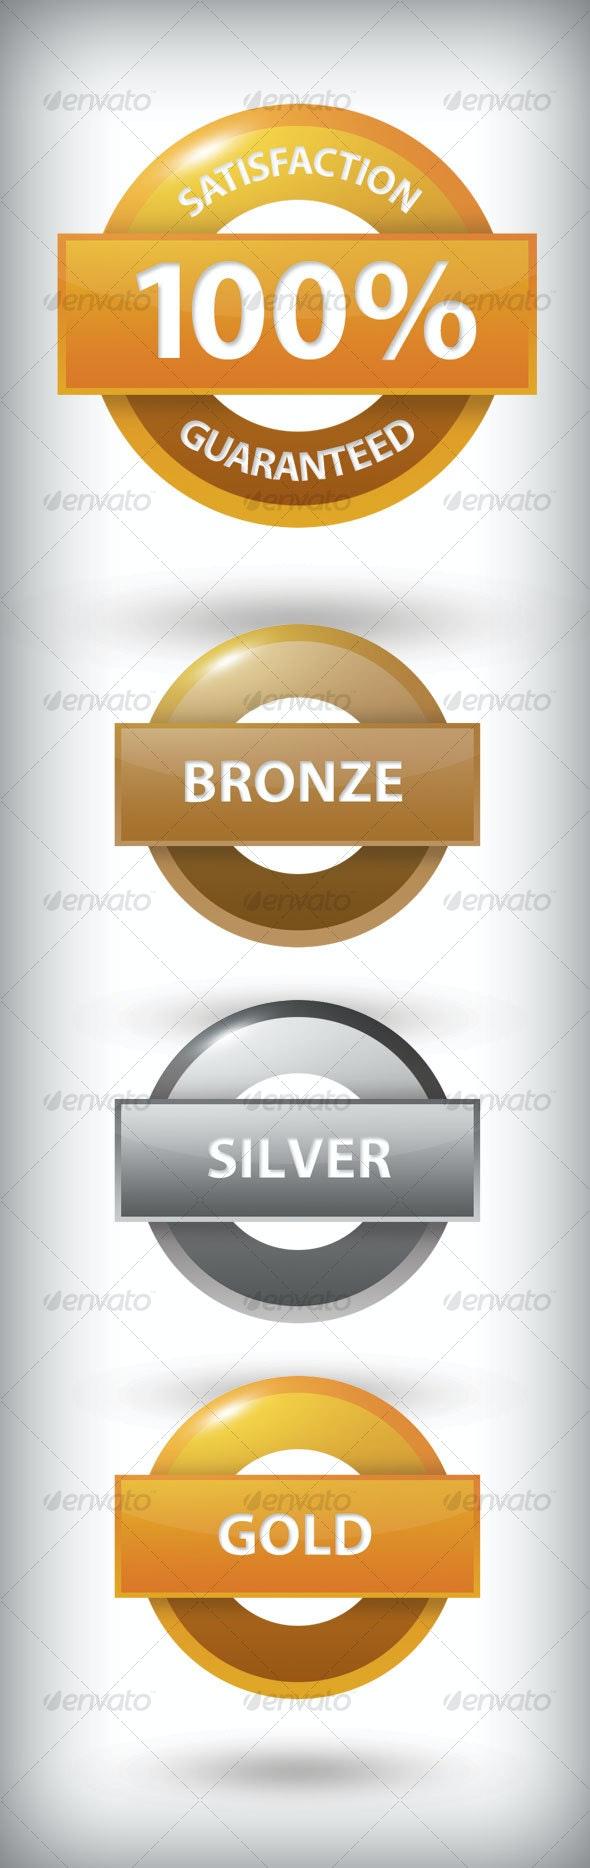 4 Medals: Guaranteed, Bronze, Silver, & Gold - Web Elements